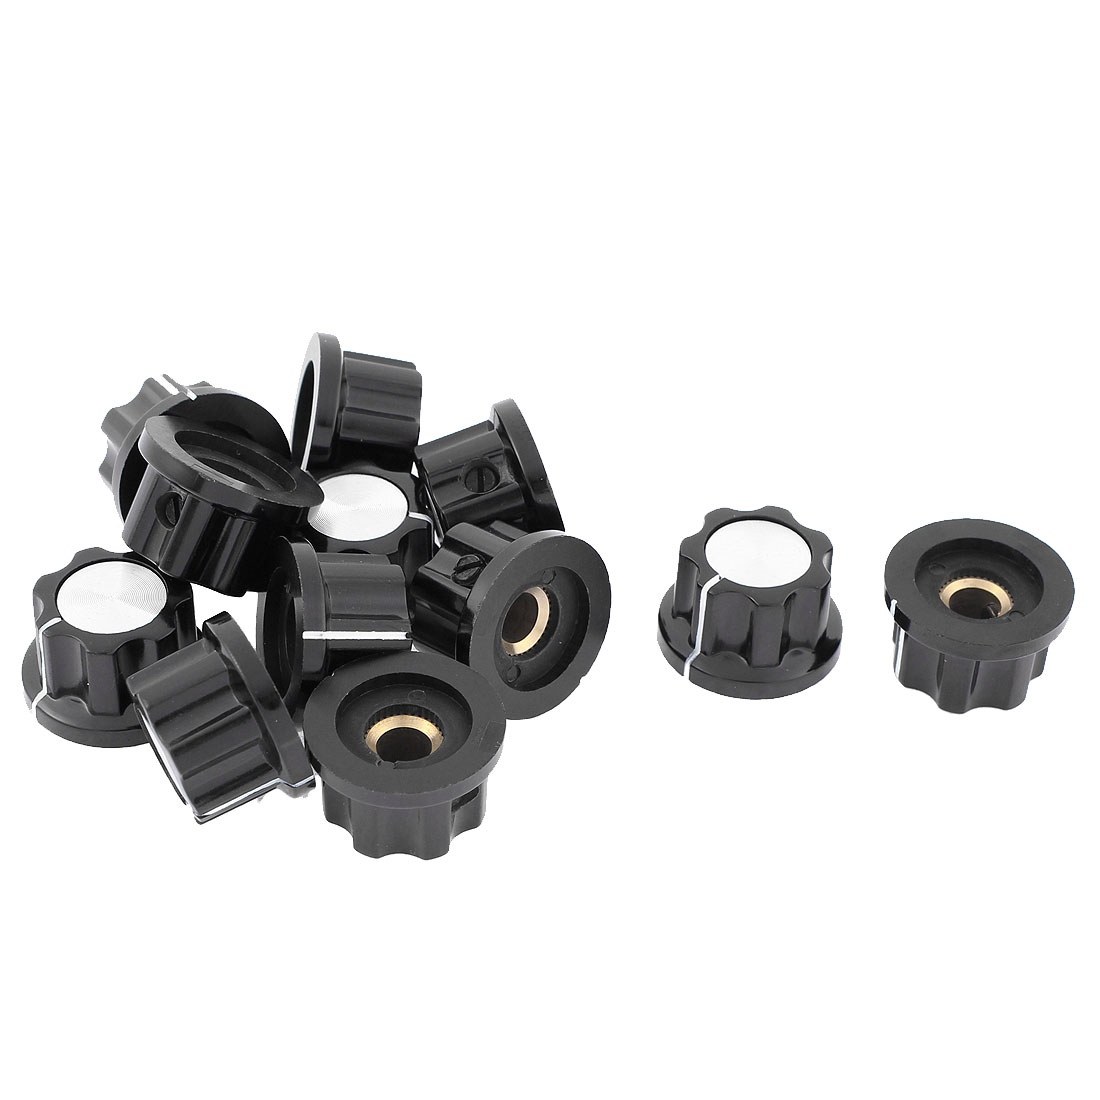 Plastic Shell Potentiometer Knob Caps 22.5mm x 13.5mm 12Pcs